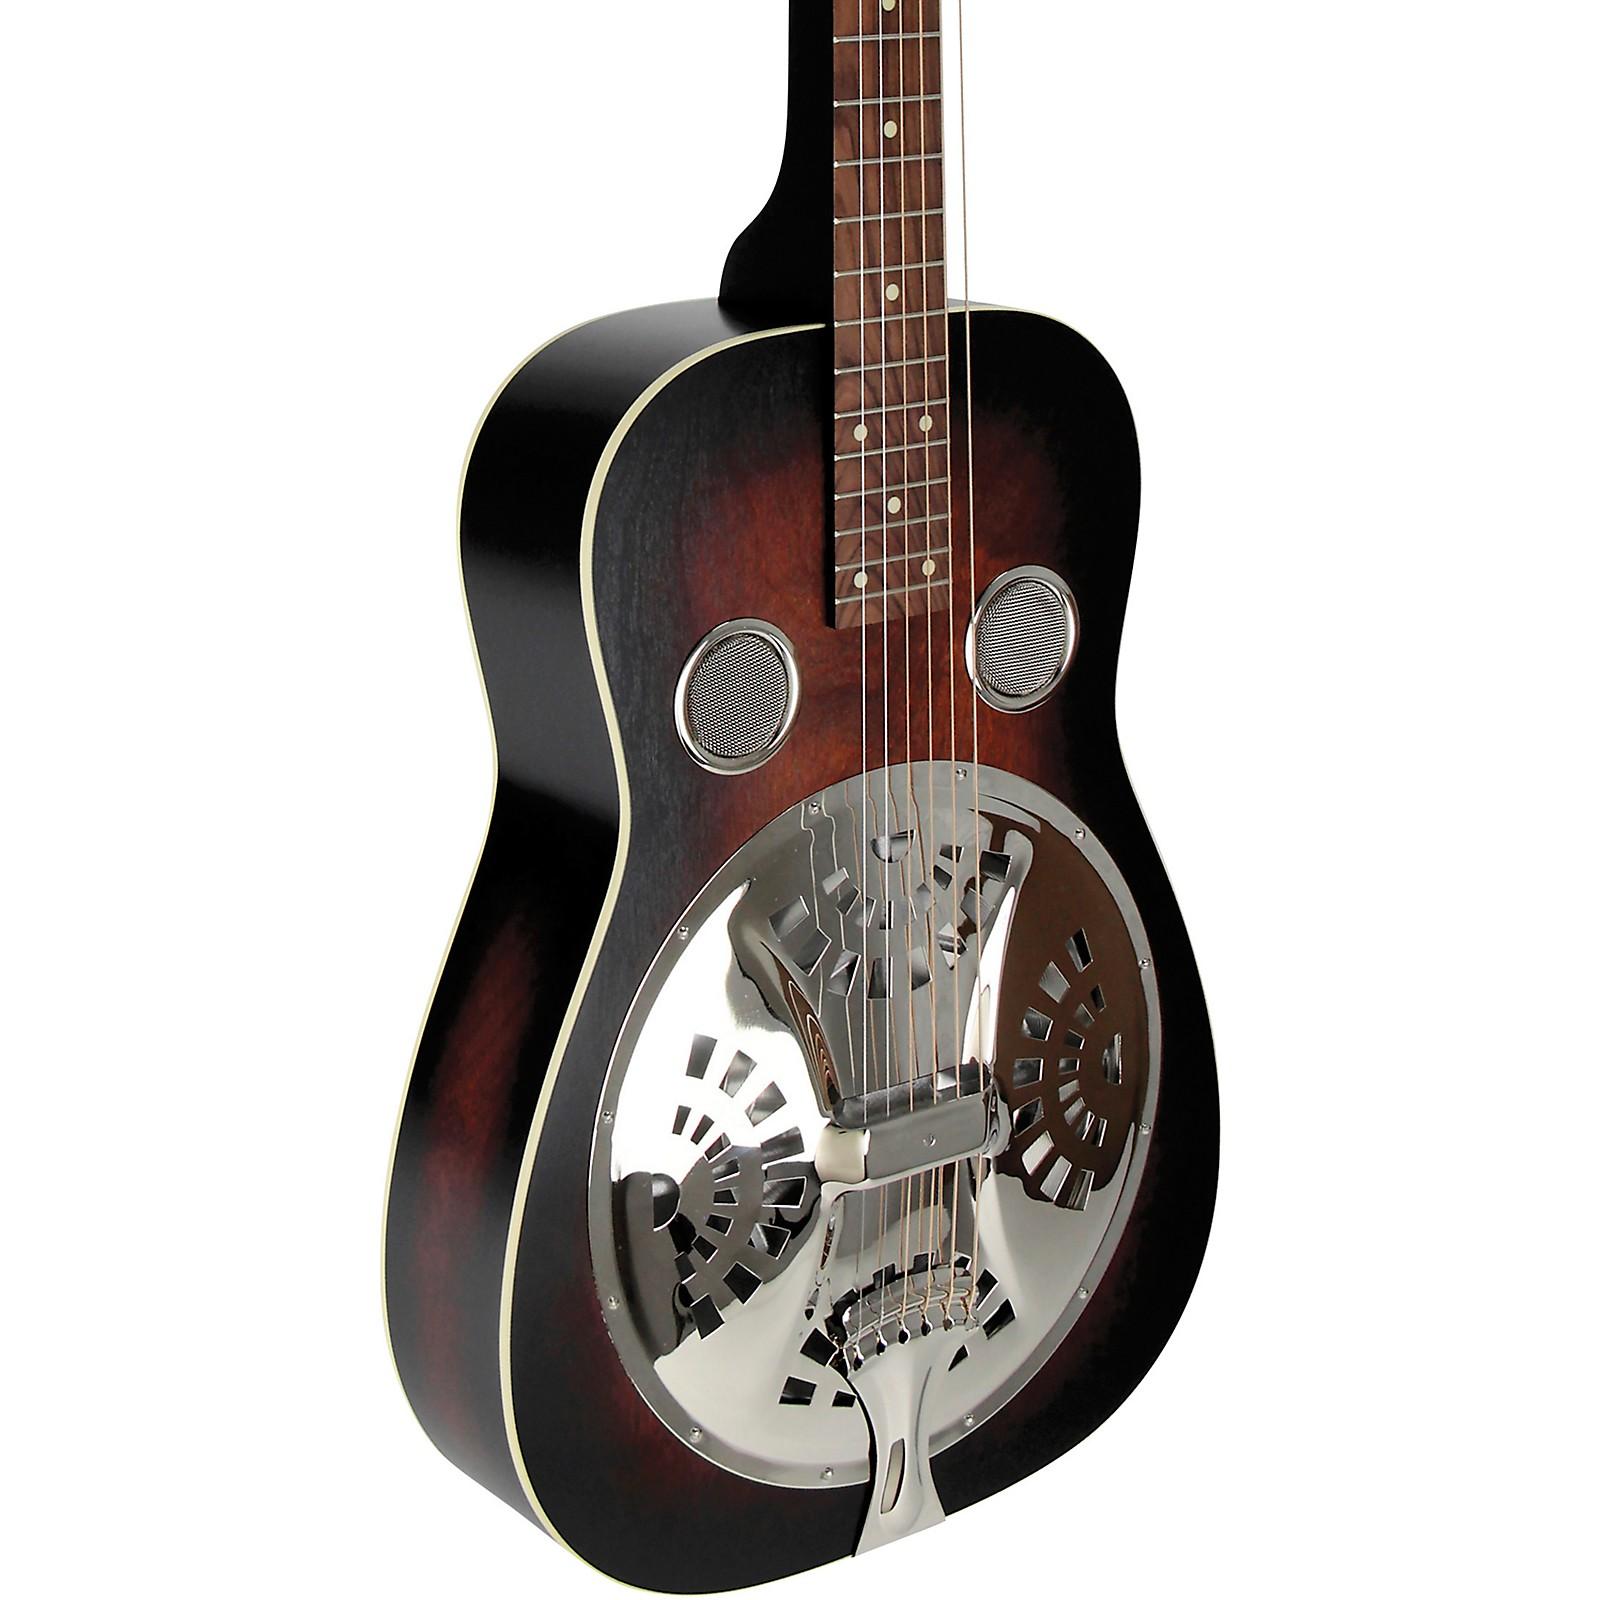 Beard Guitars Deco Phonic Model 57 Squareneck Left-Handed Resonator Guitar